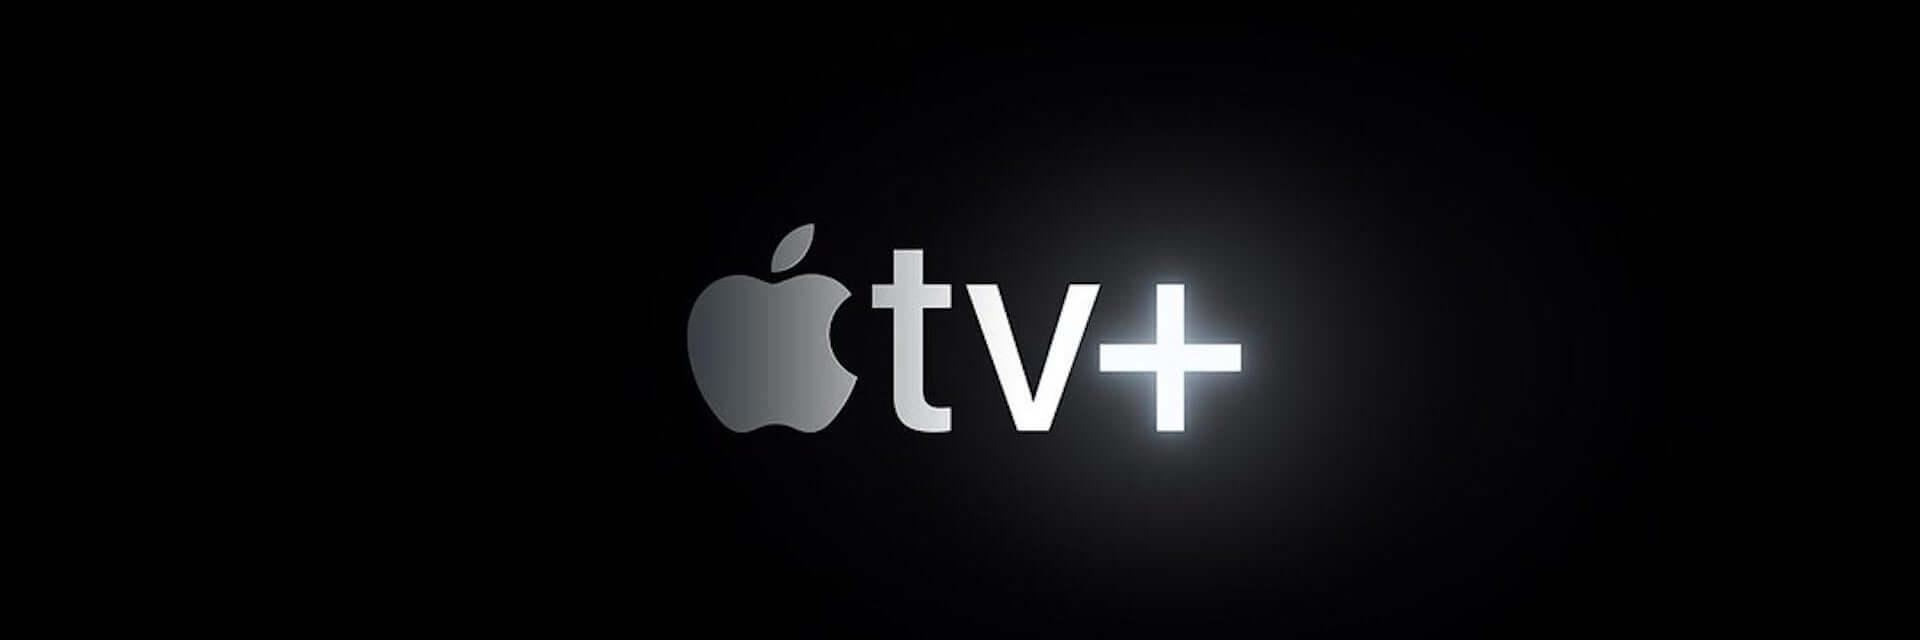 Apple TV+のローンチ日程が11月に決定か|月額の使用料金も判明 tech190820_appletv_1-1920x640